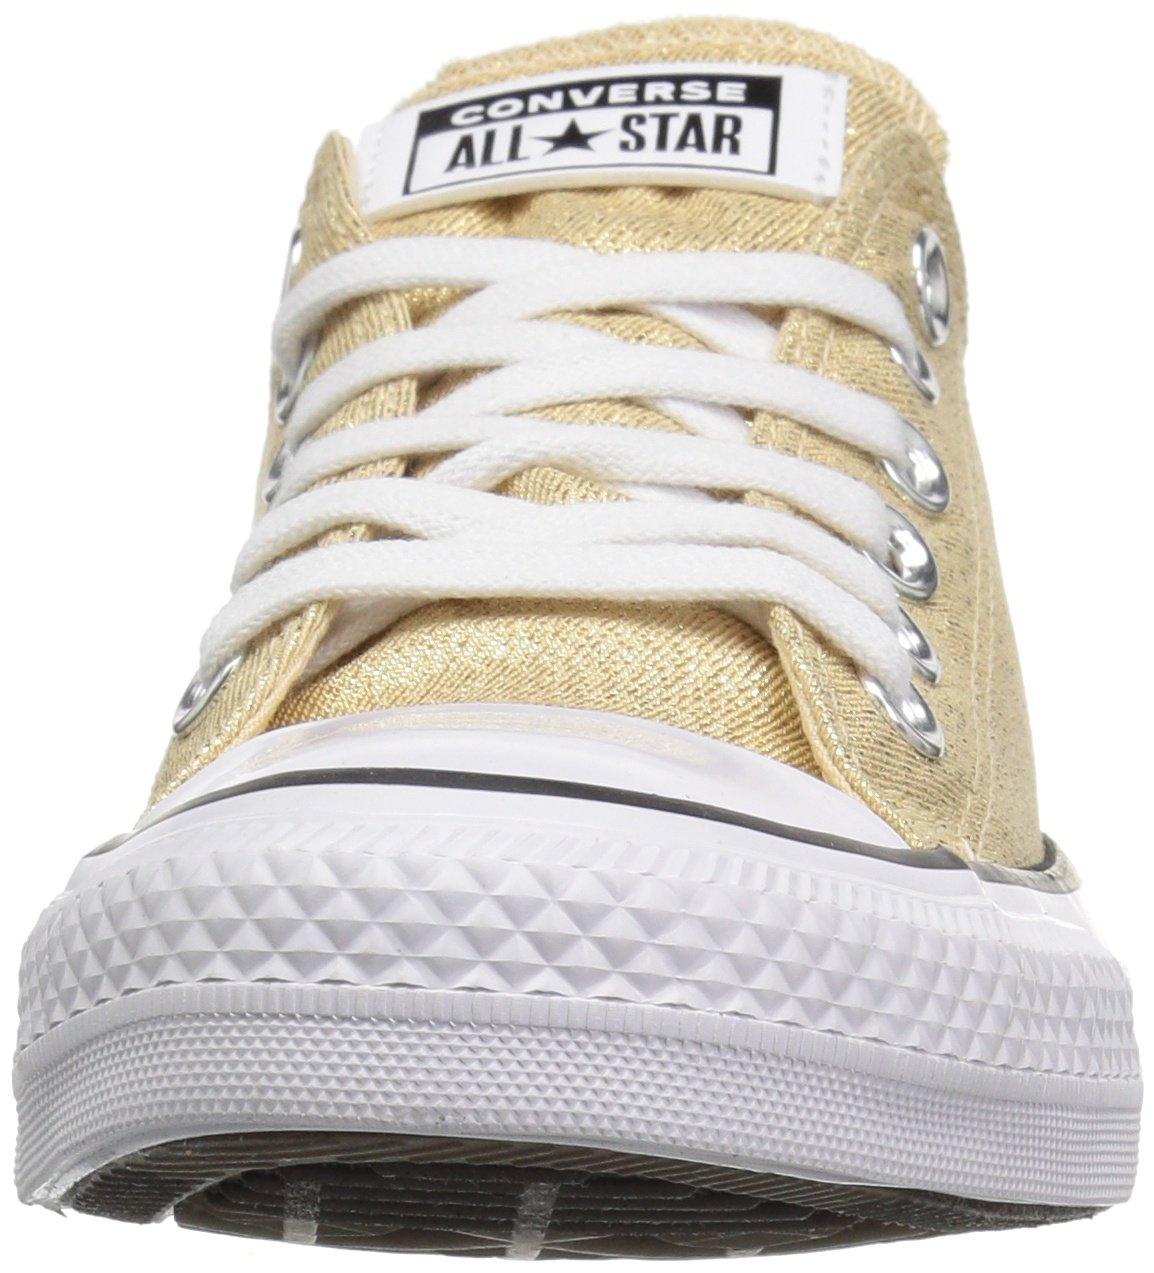 Converse Women's Chuck Taylor All Star Shiny Tile Low Top Sneaker B078NFNW85 9.5 M US|Light Twine/White/Black